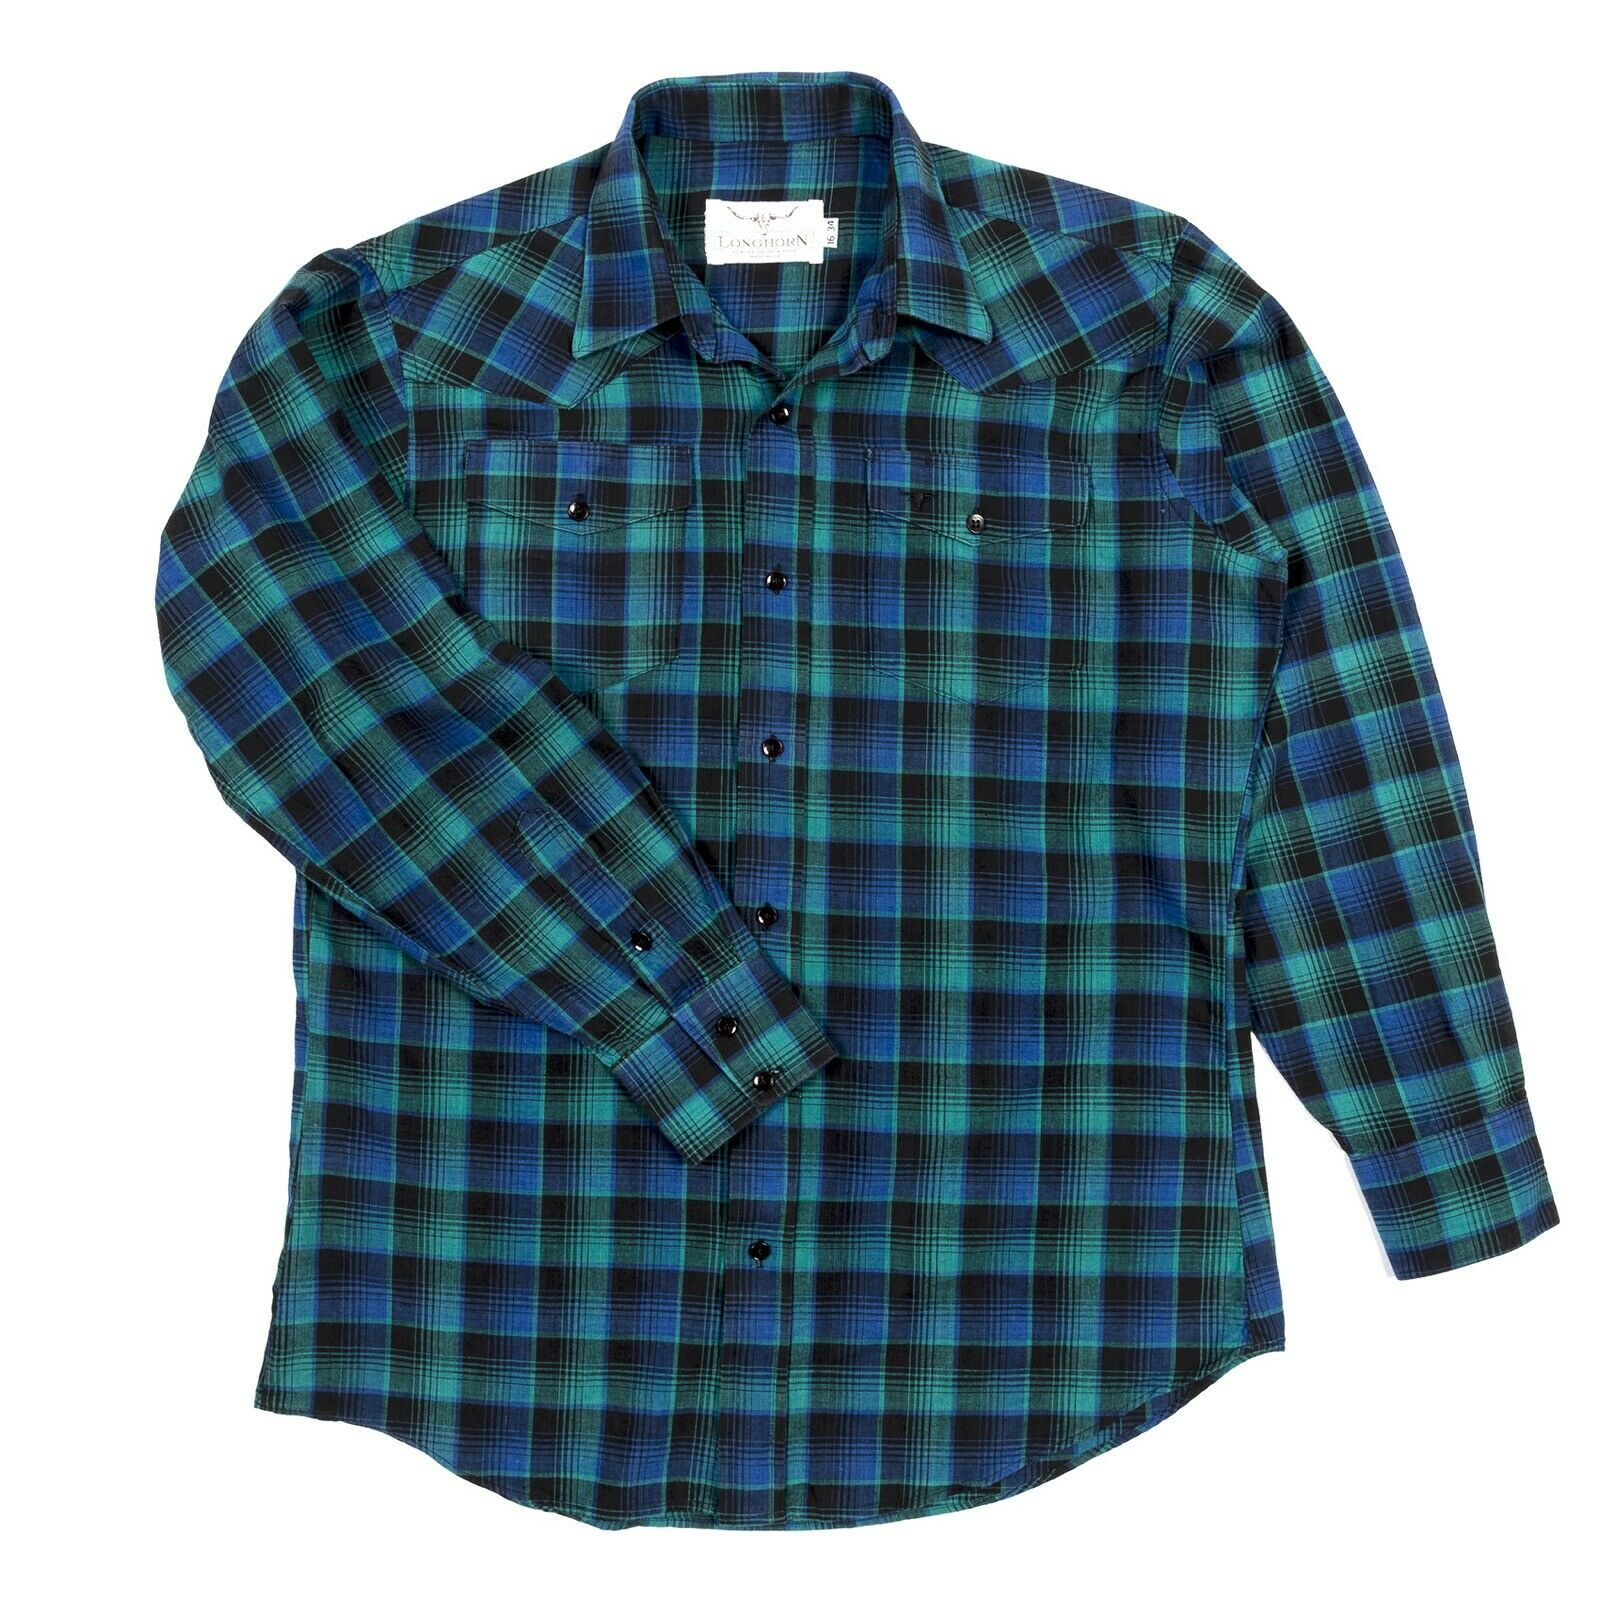 Longhorn River Western Wear Pearl Snap Mens Shirt 16 34 bluee & green plaid NWOT